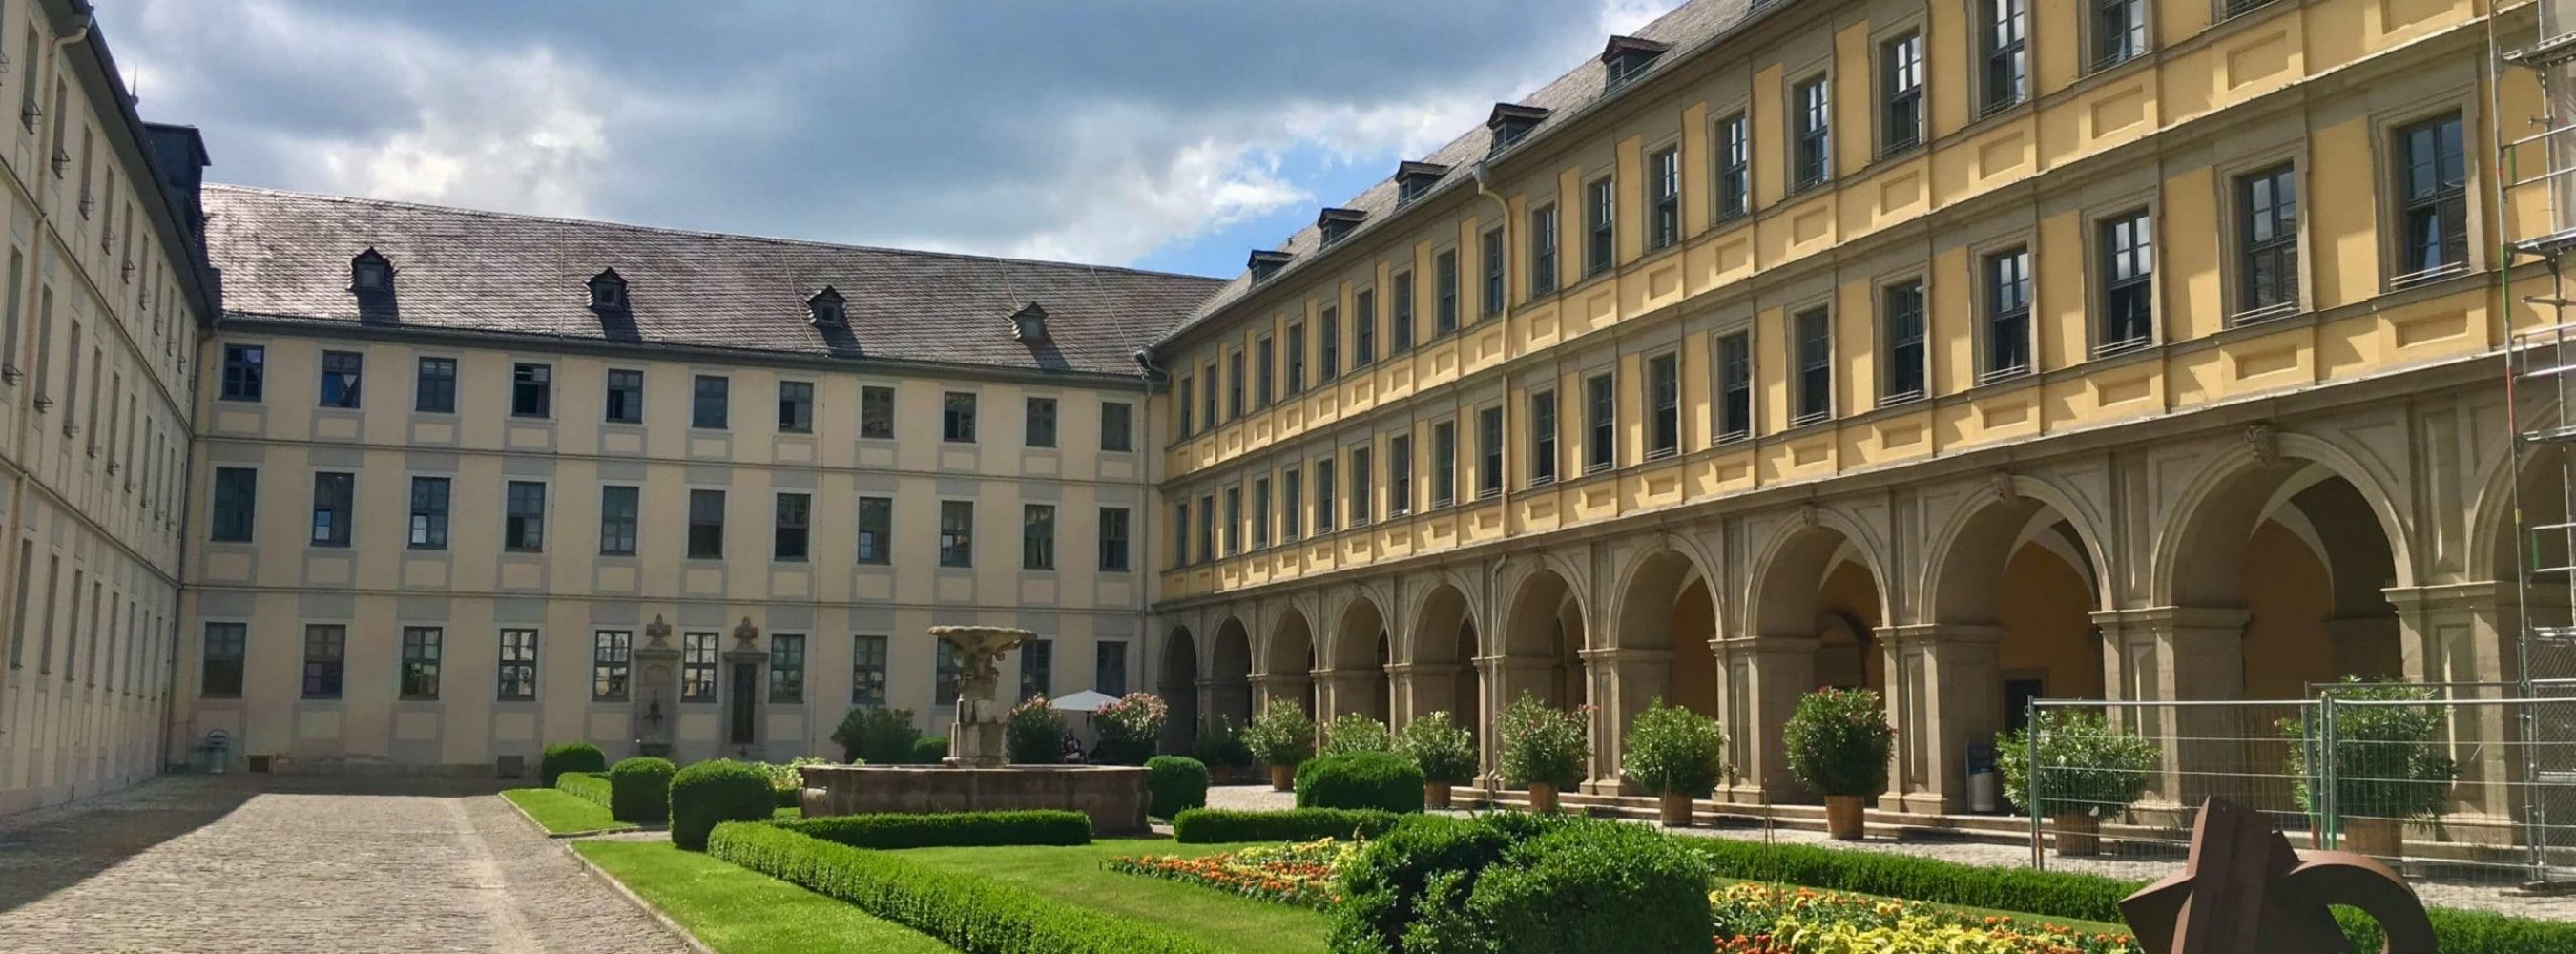 Innenhof des Juliusspitals